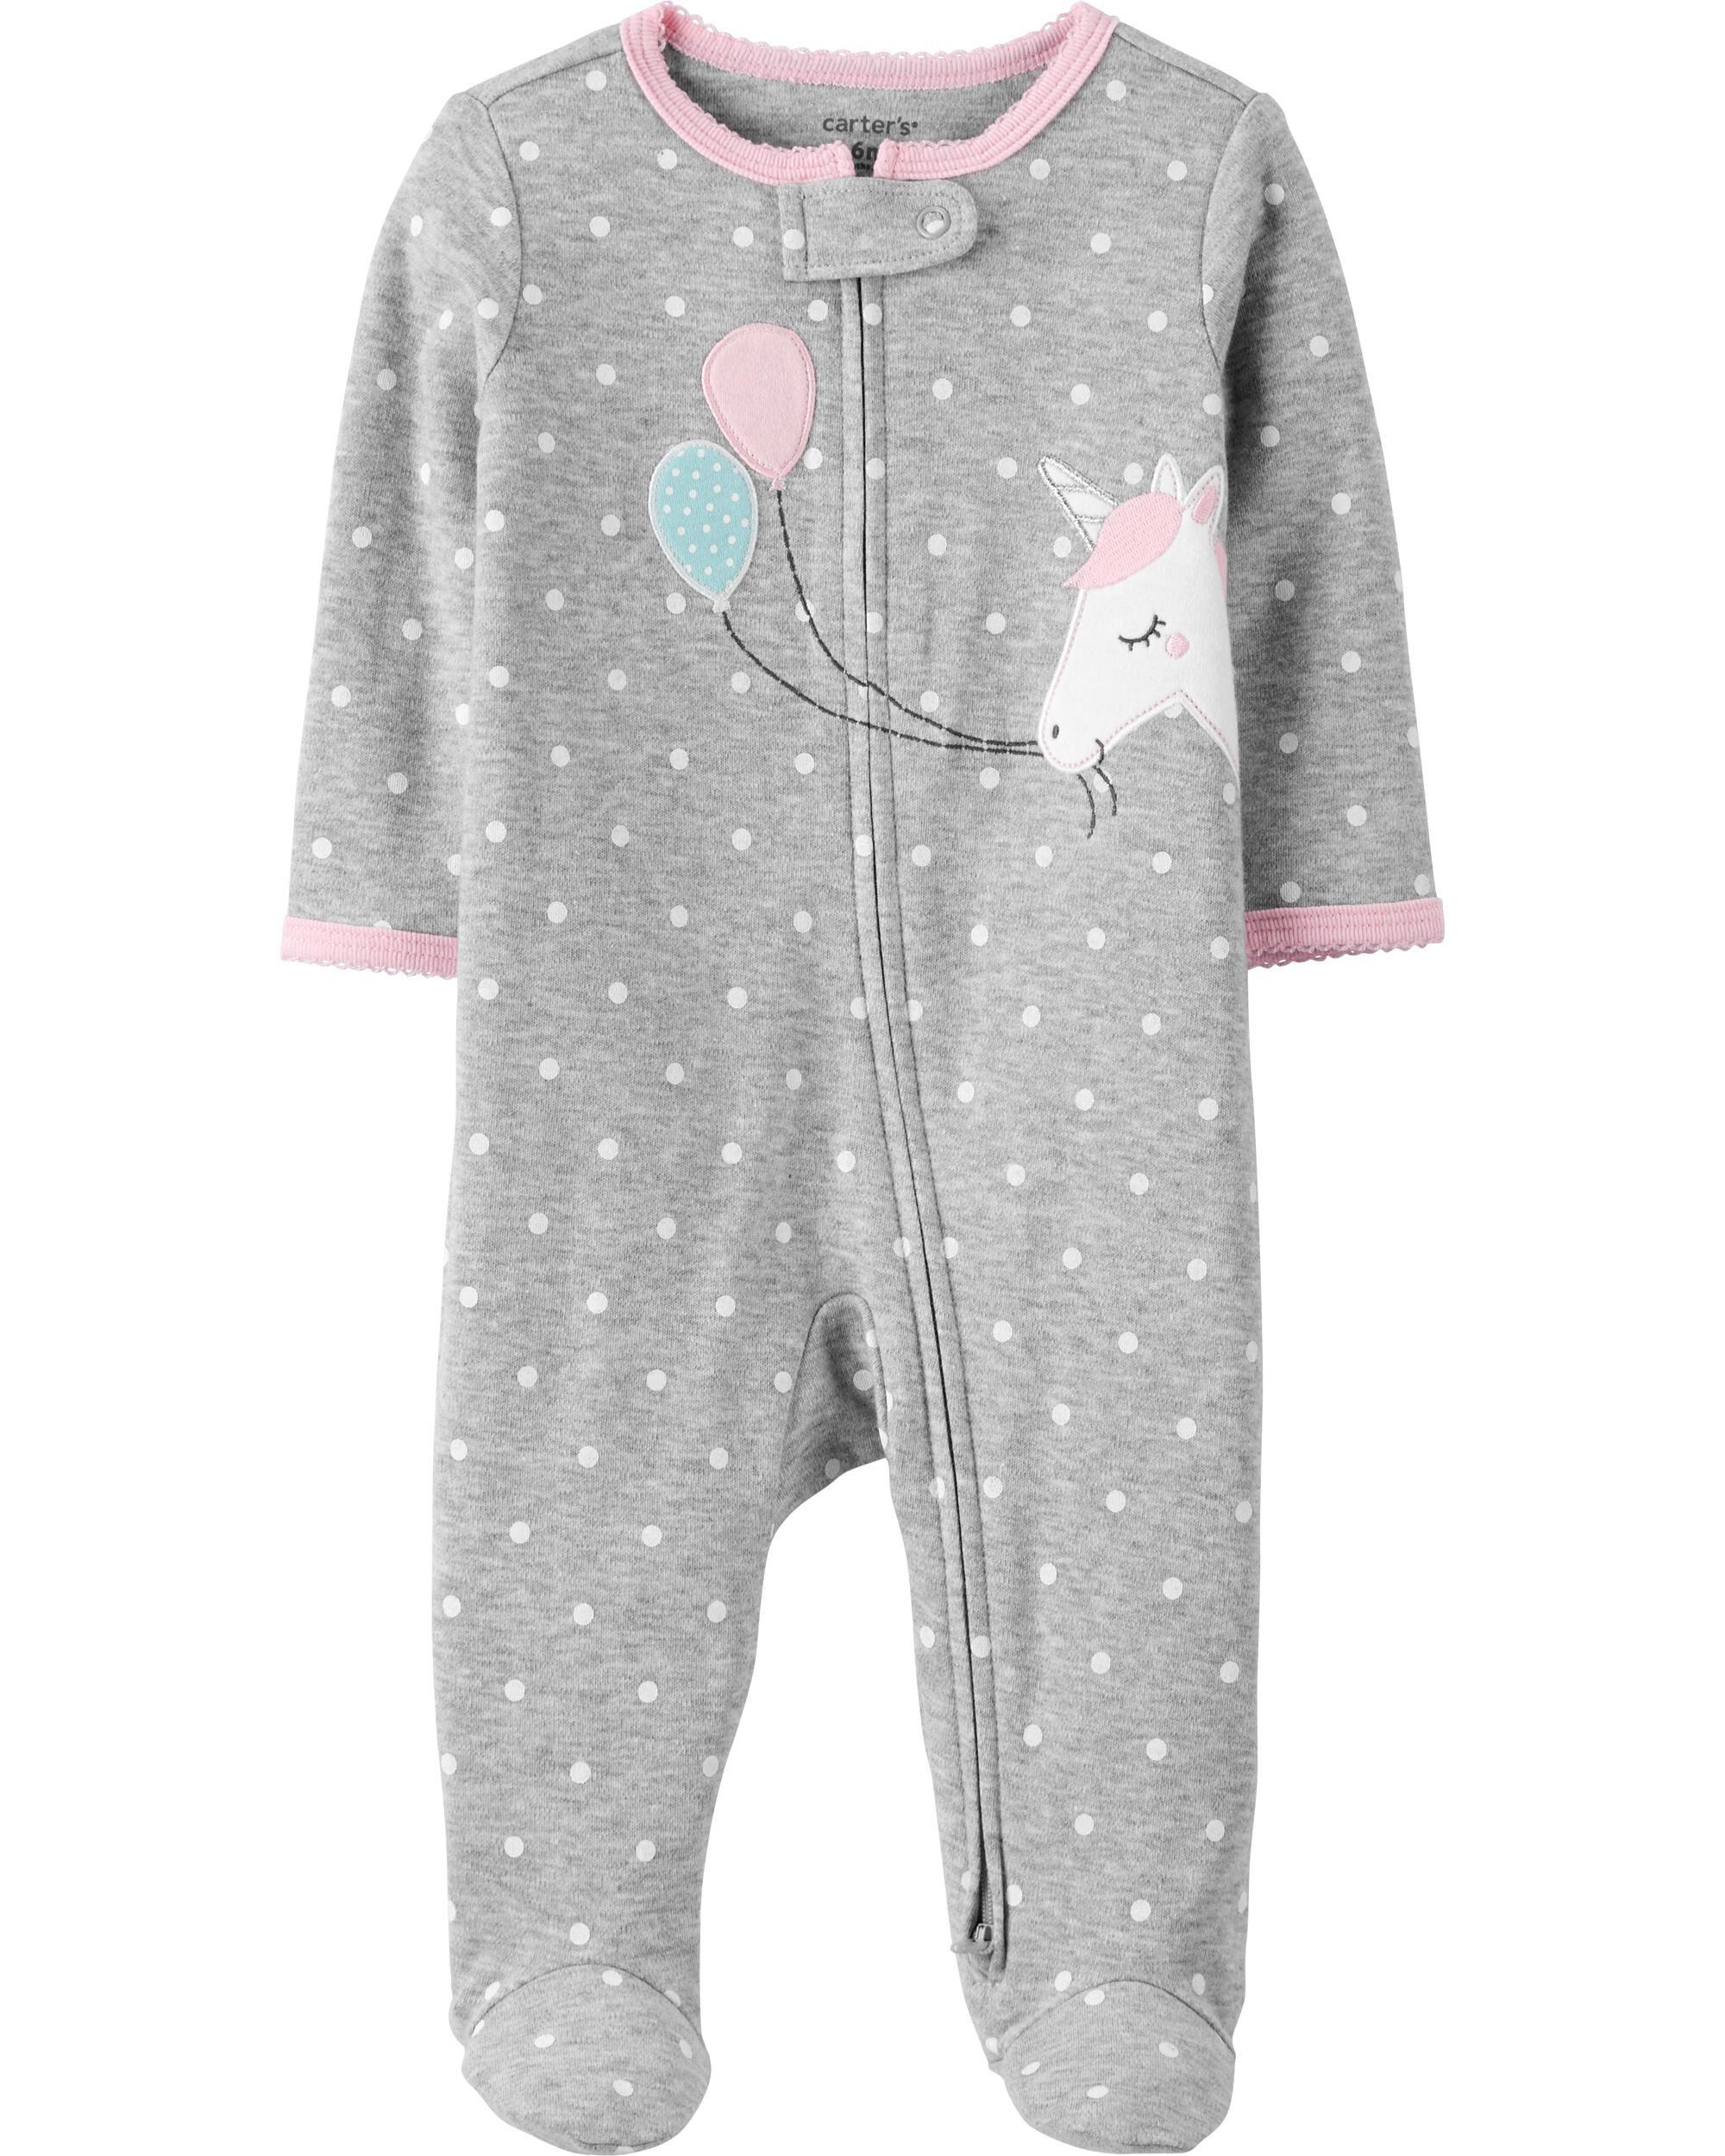 Baby Gap Long Pajamas Ice Skating FOX Snowflake 12-18M 2T